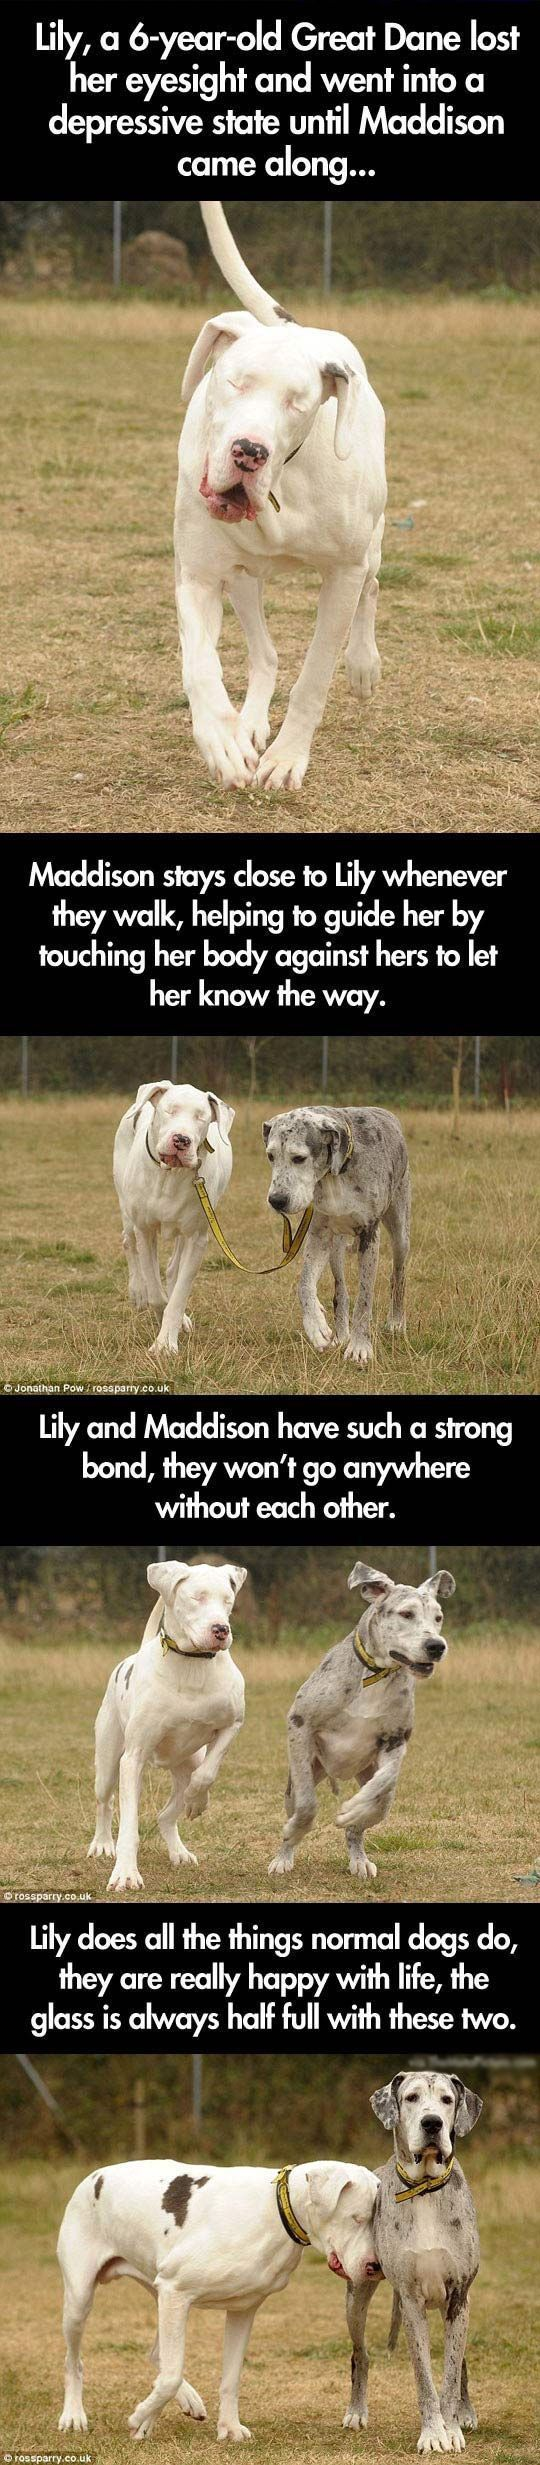 Best Sad Dog Stories Ideas On Pinterest Dog Stories - 25 heartwarming moments animals hugging